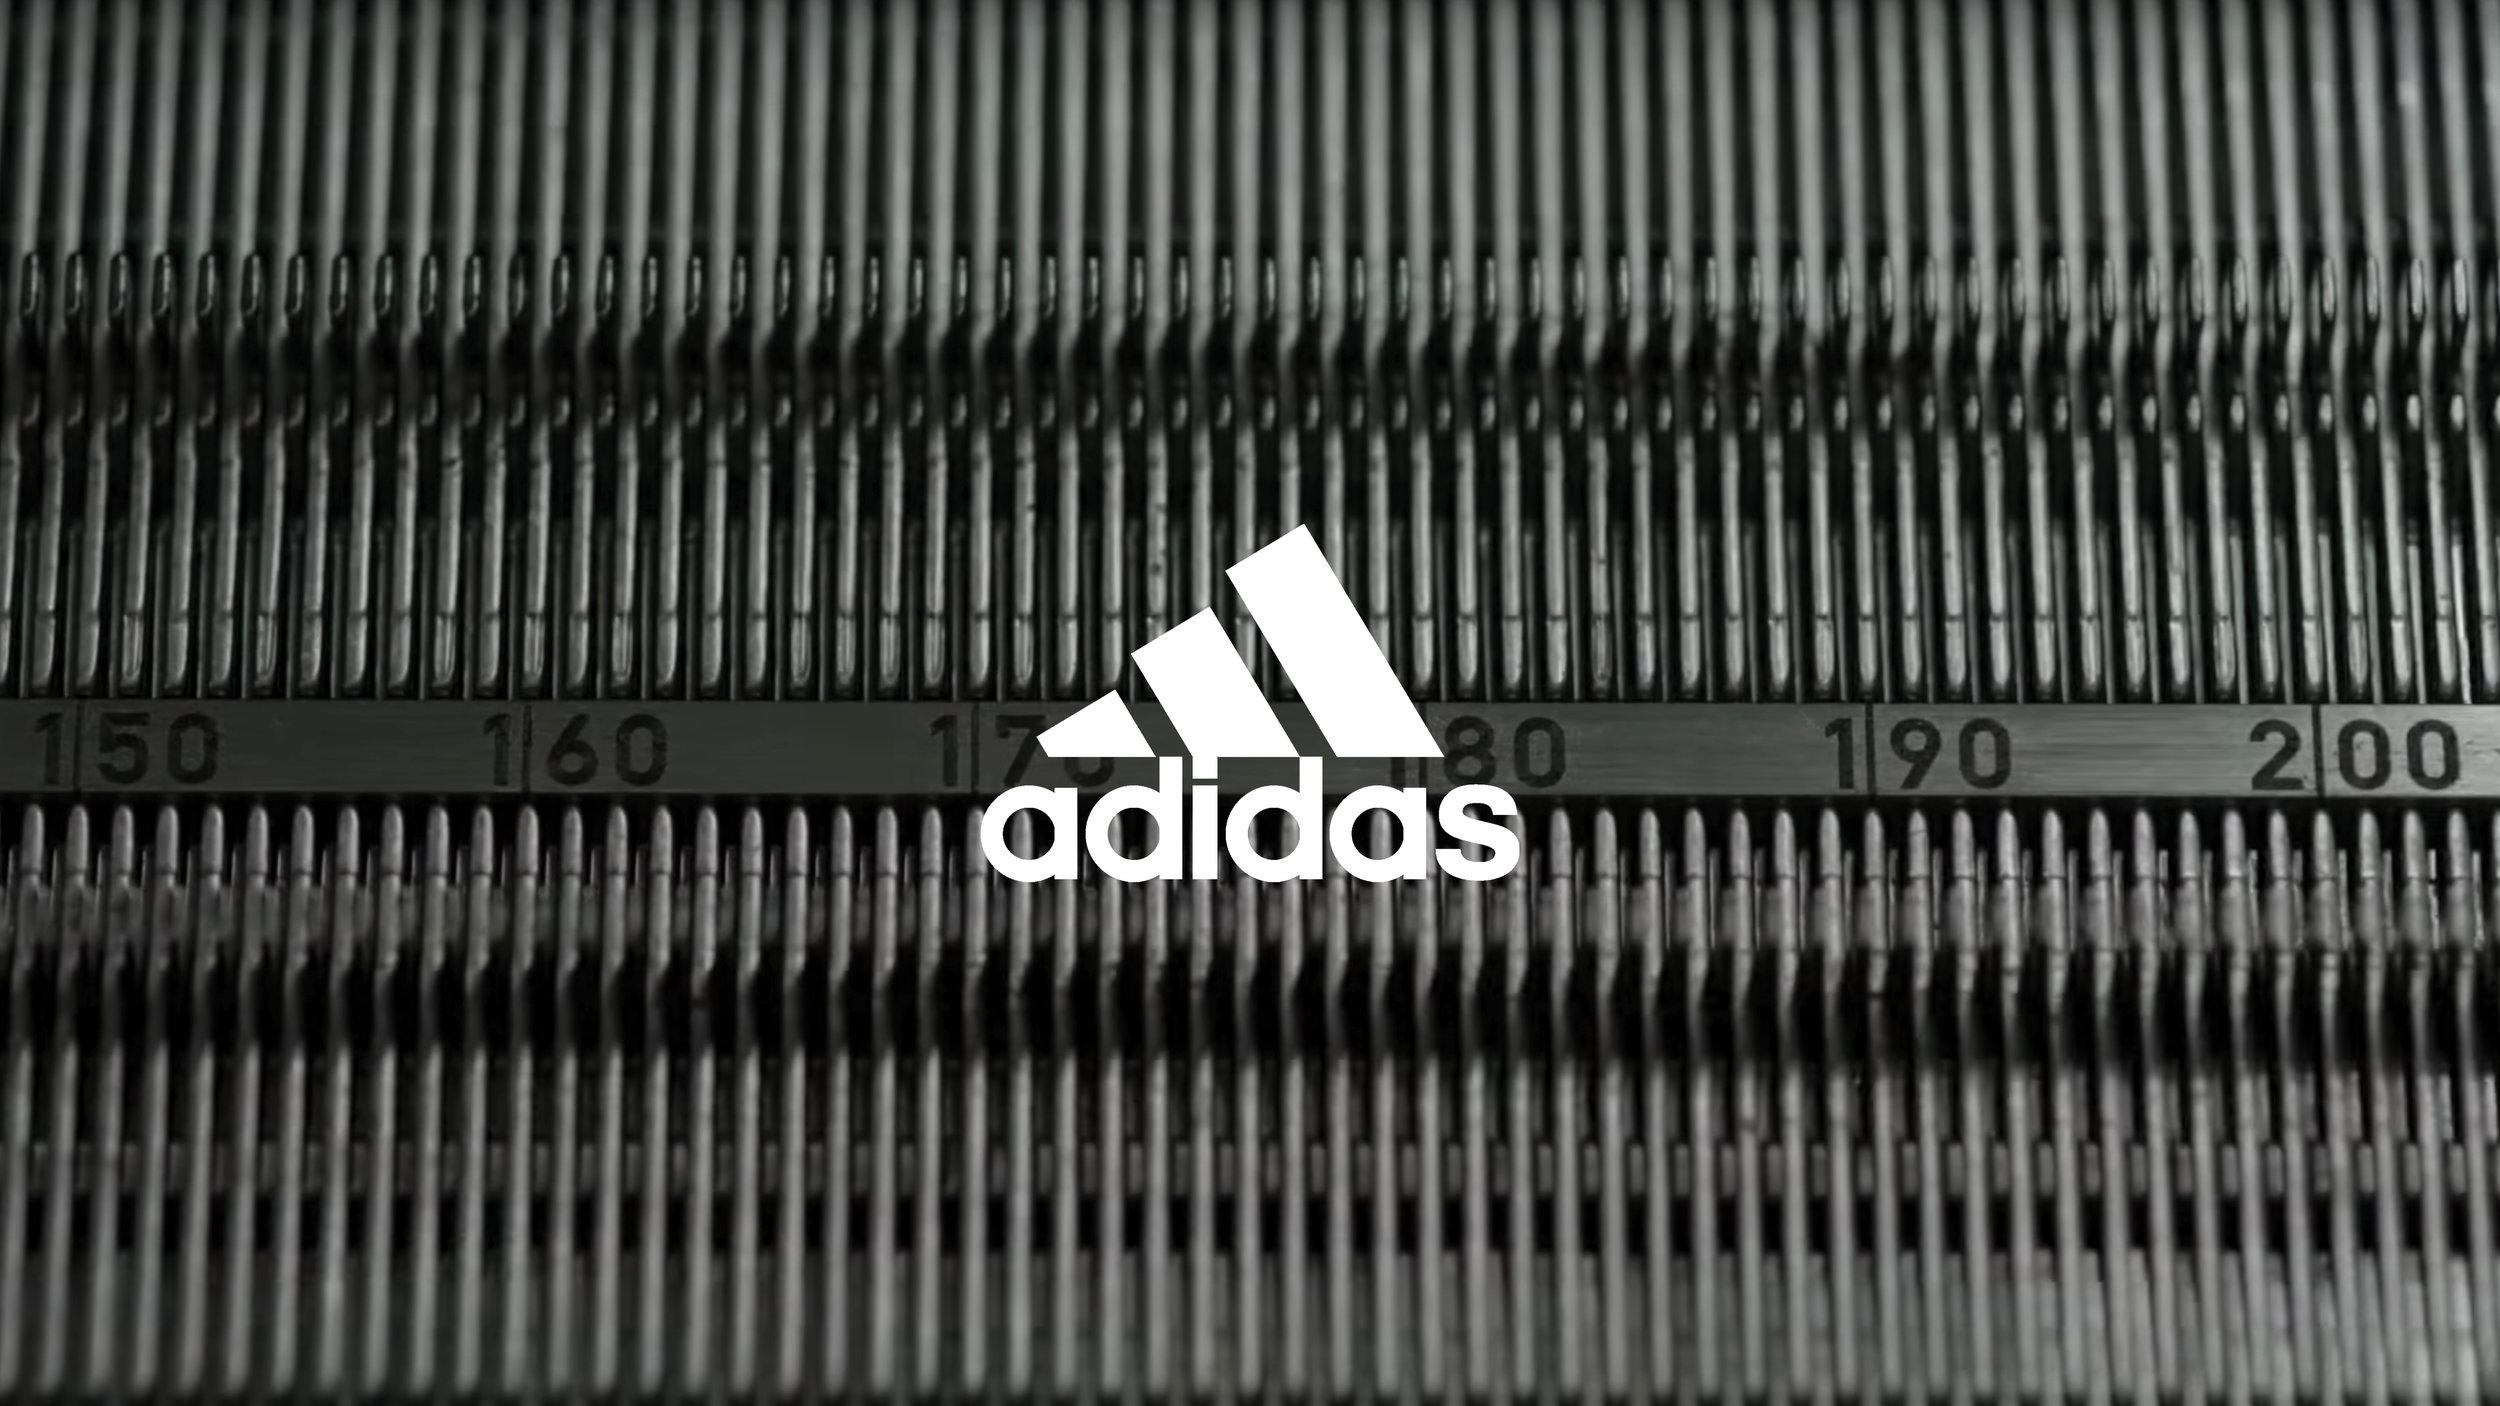 Adidas_Thumbnail.jpg